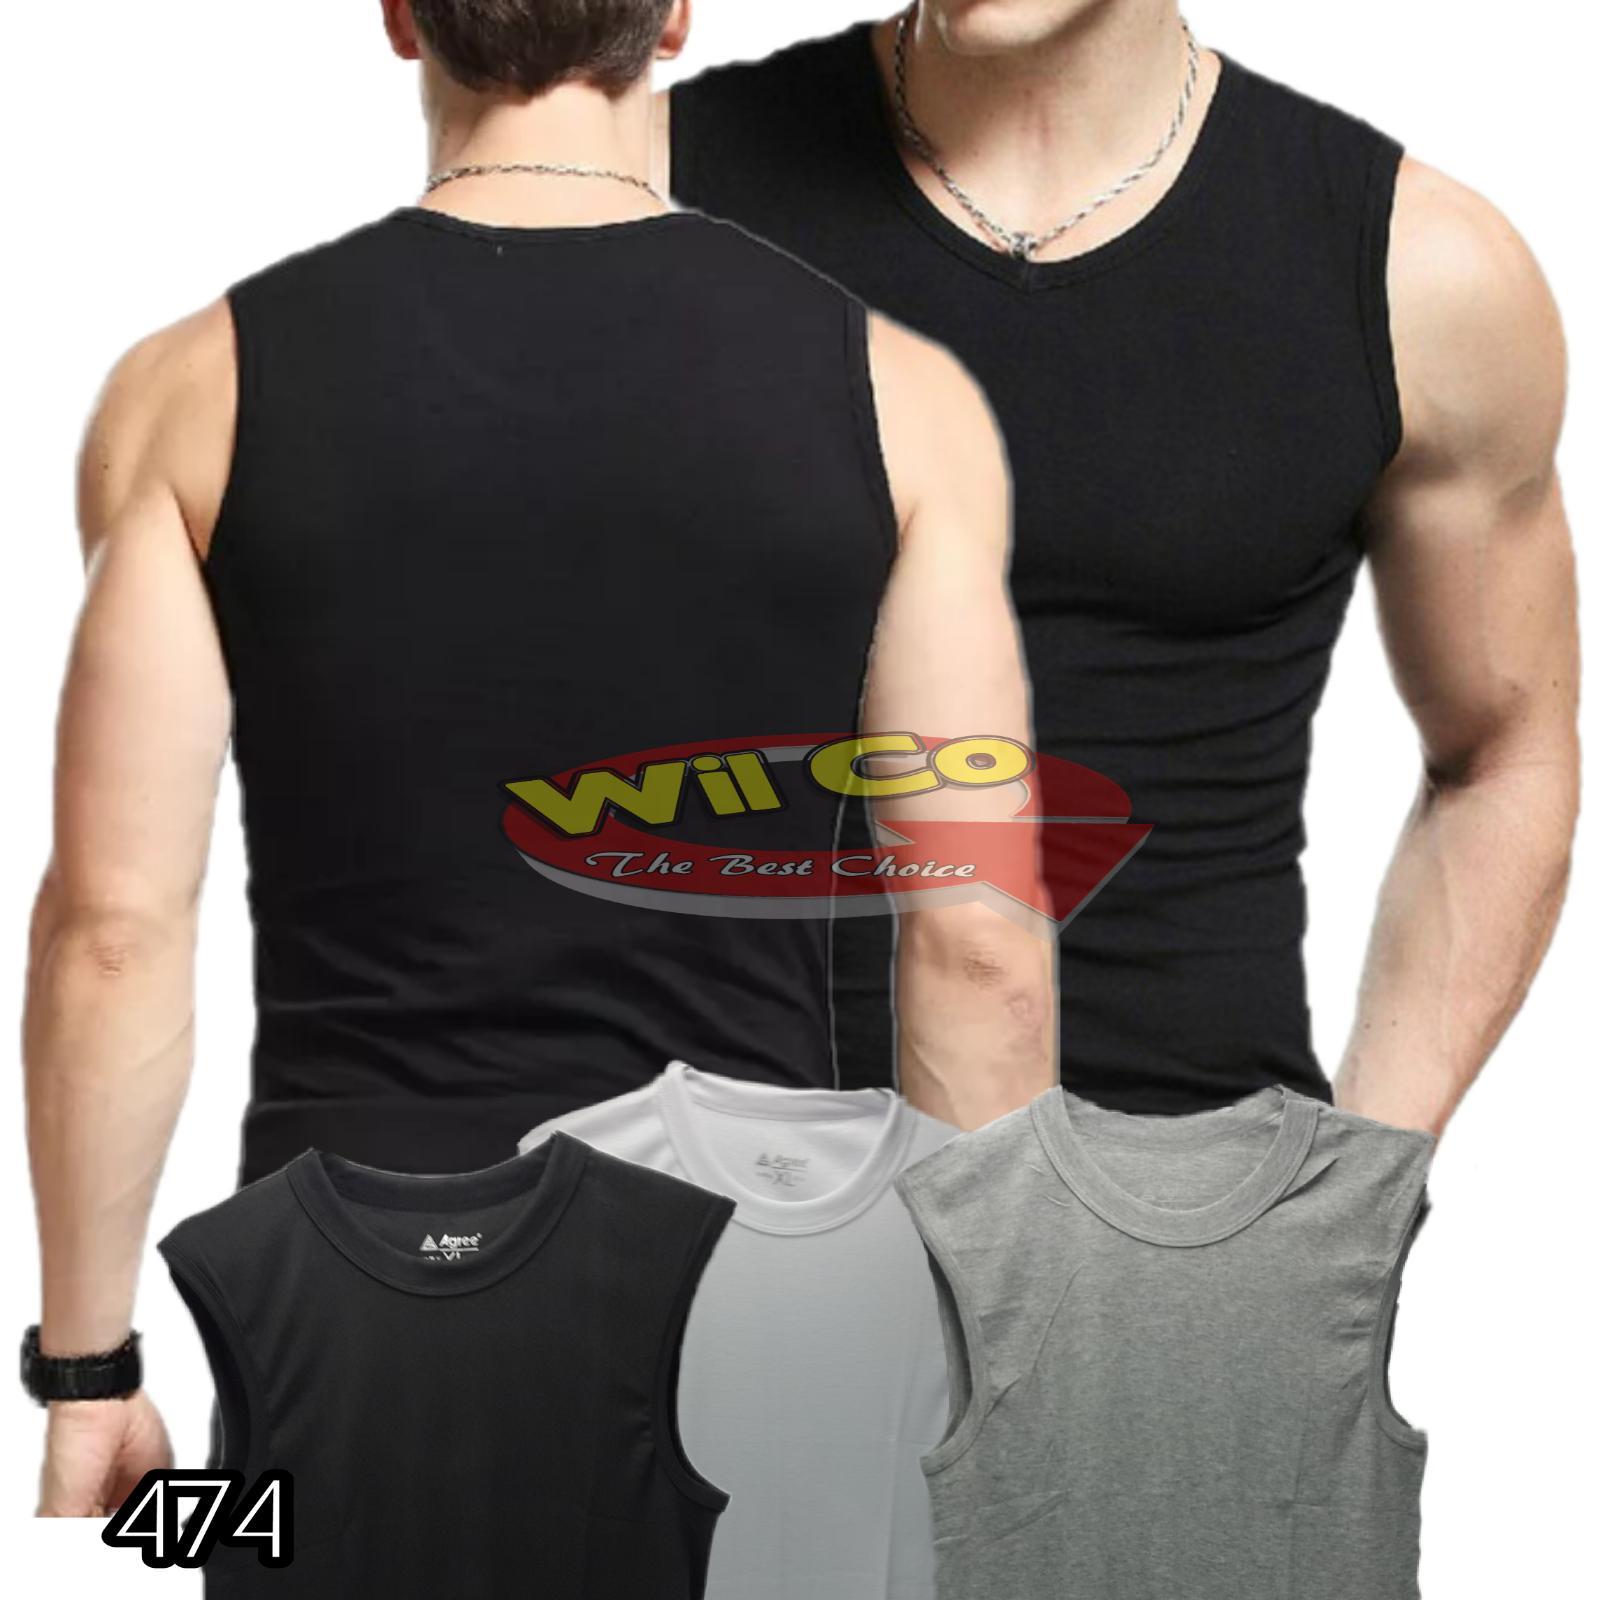 K474 - Kaos Pria - Kaos Oblong - Kaos Tanktop - Kaos Fitness - Singlet Agree 01879ec672